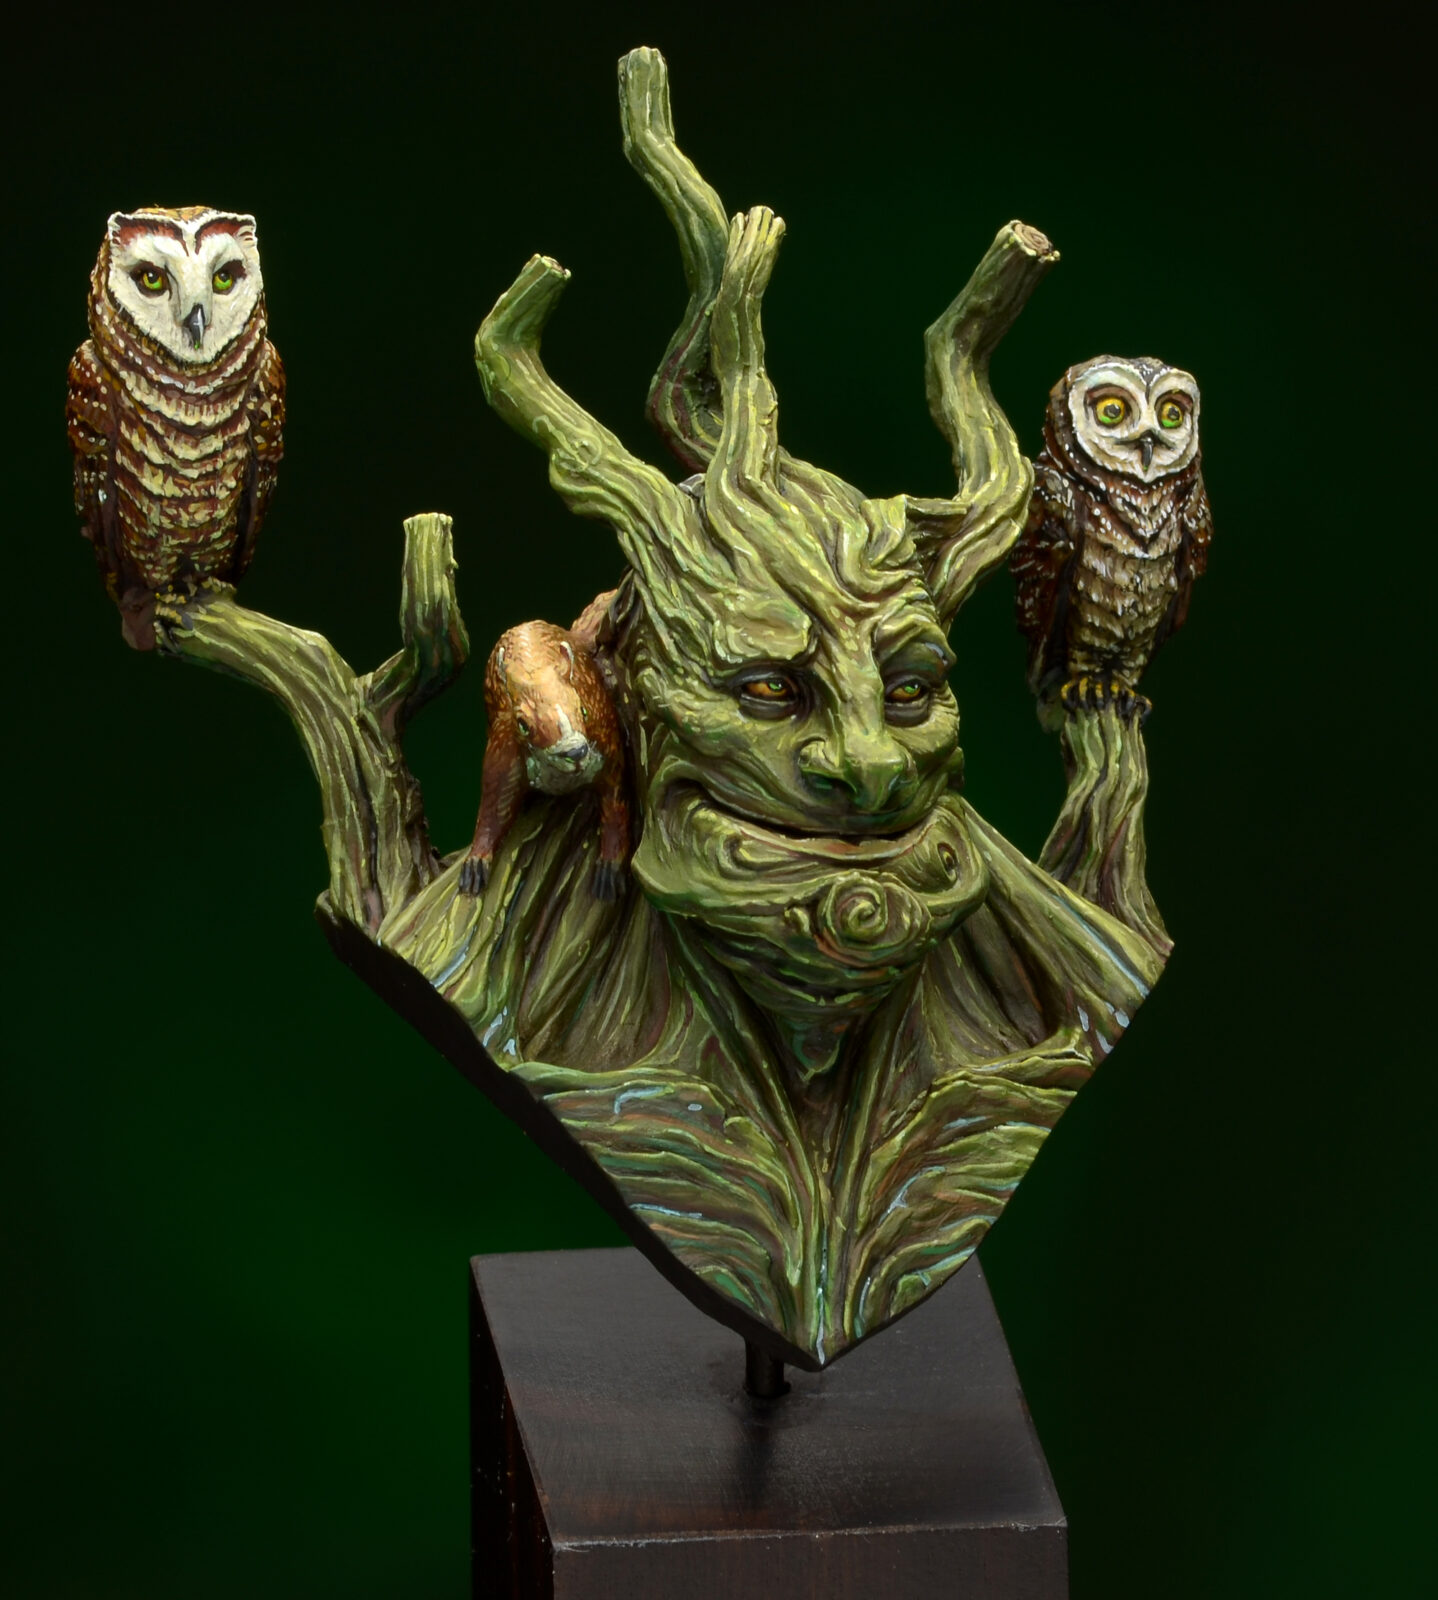 Treeman52